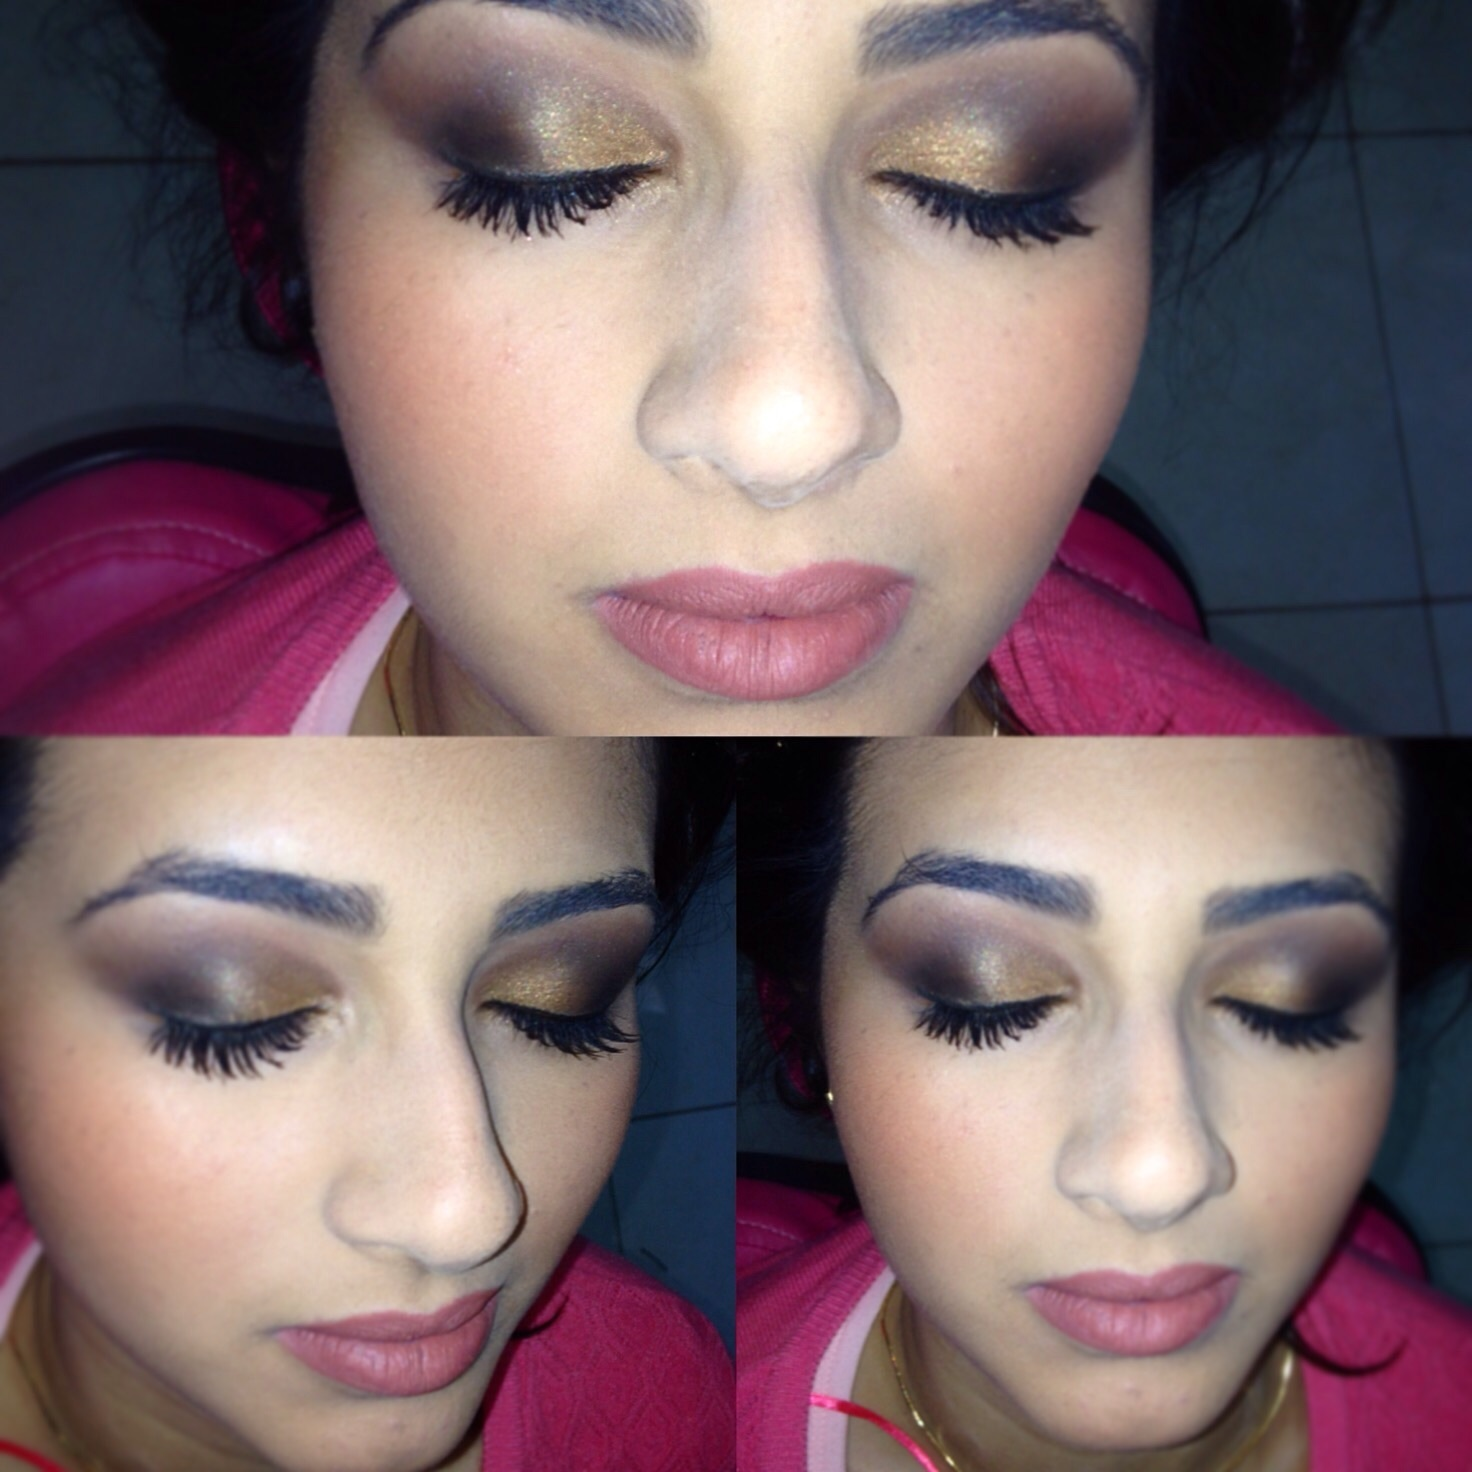 Maquiagem  Maquiagem  maquiagem  maquiador(a)